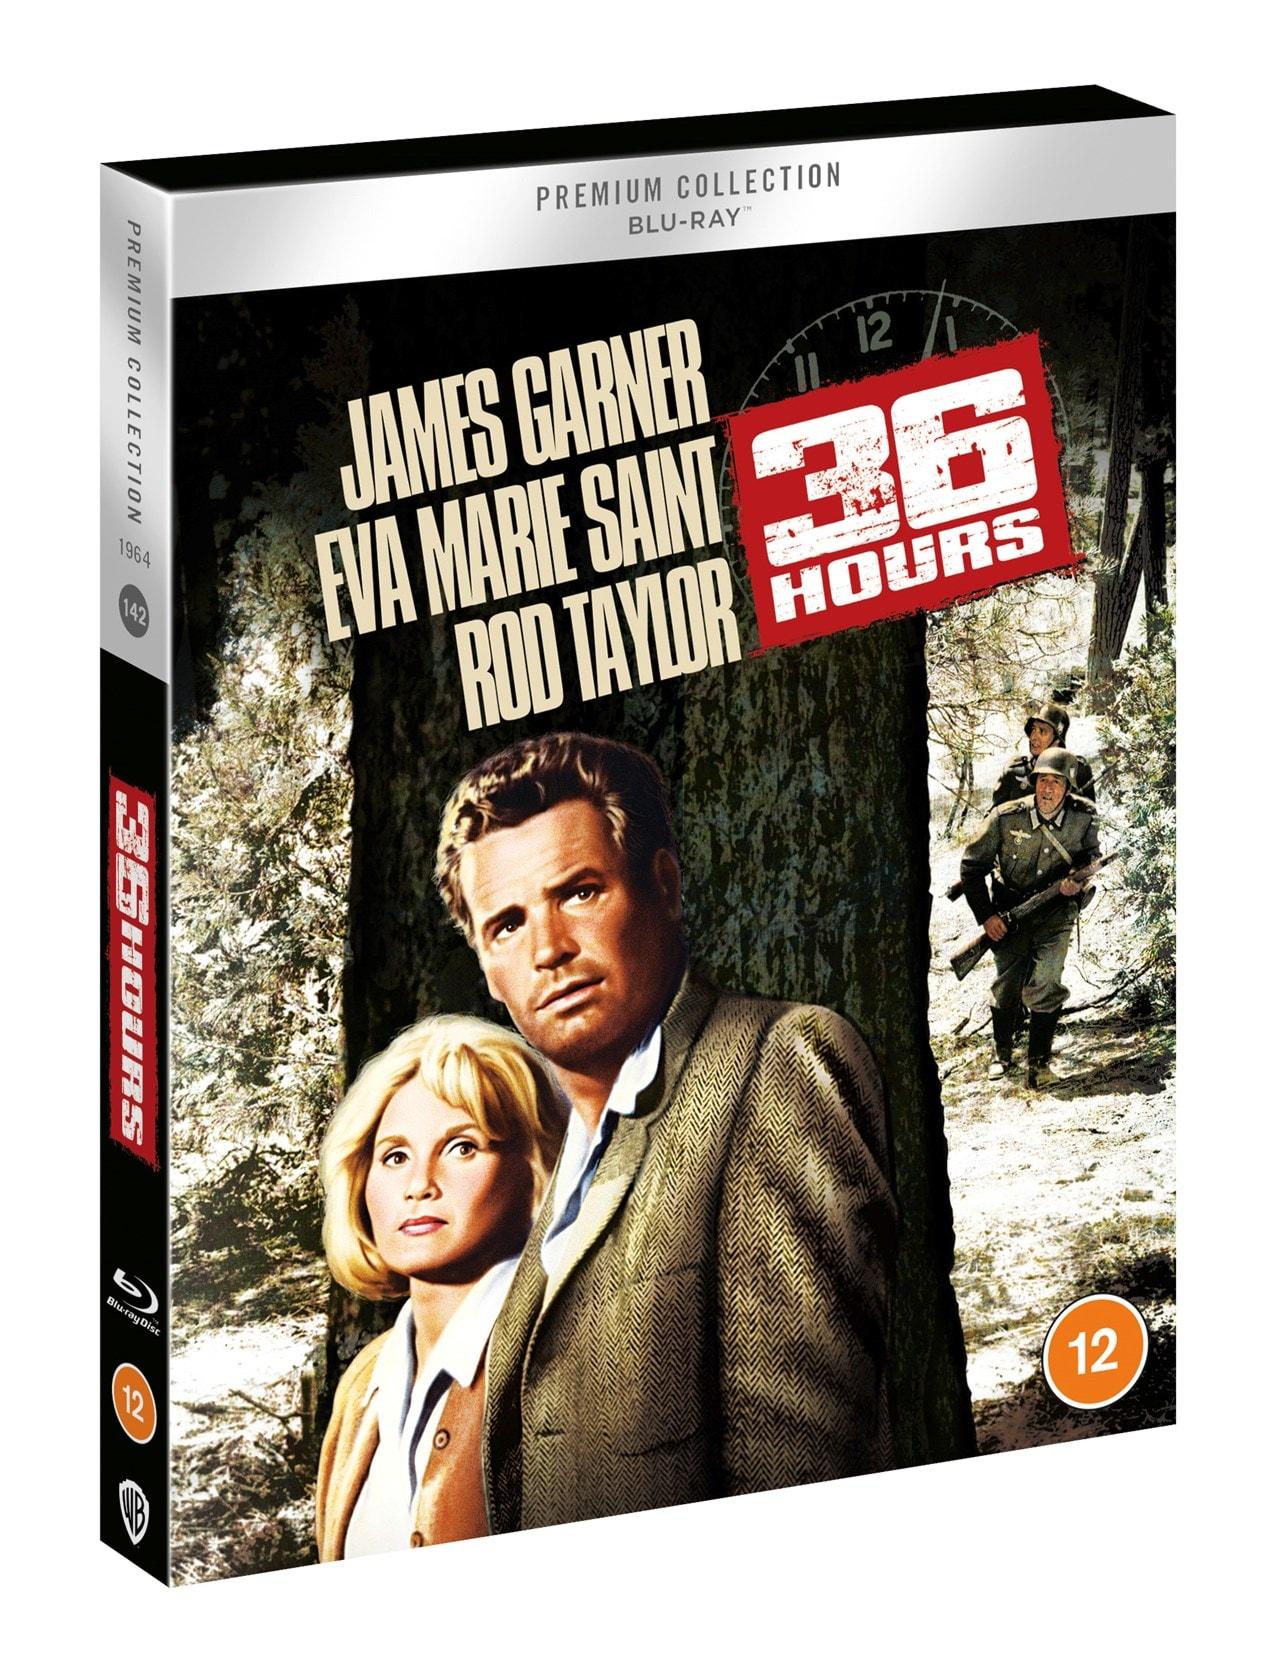 36 Hours (hmv Exclusive) - The Premium Collection - 2